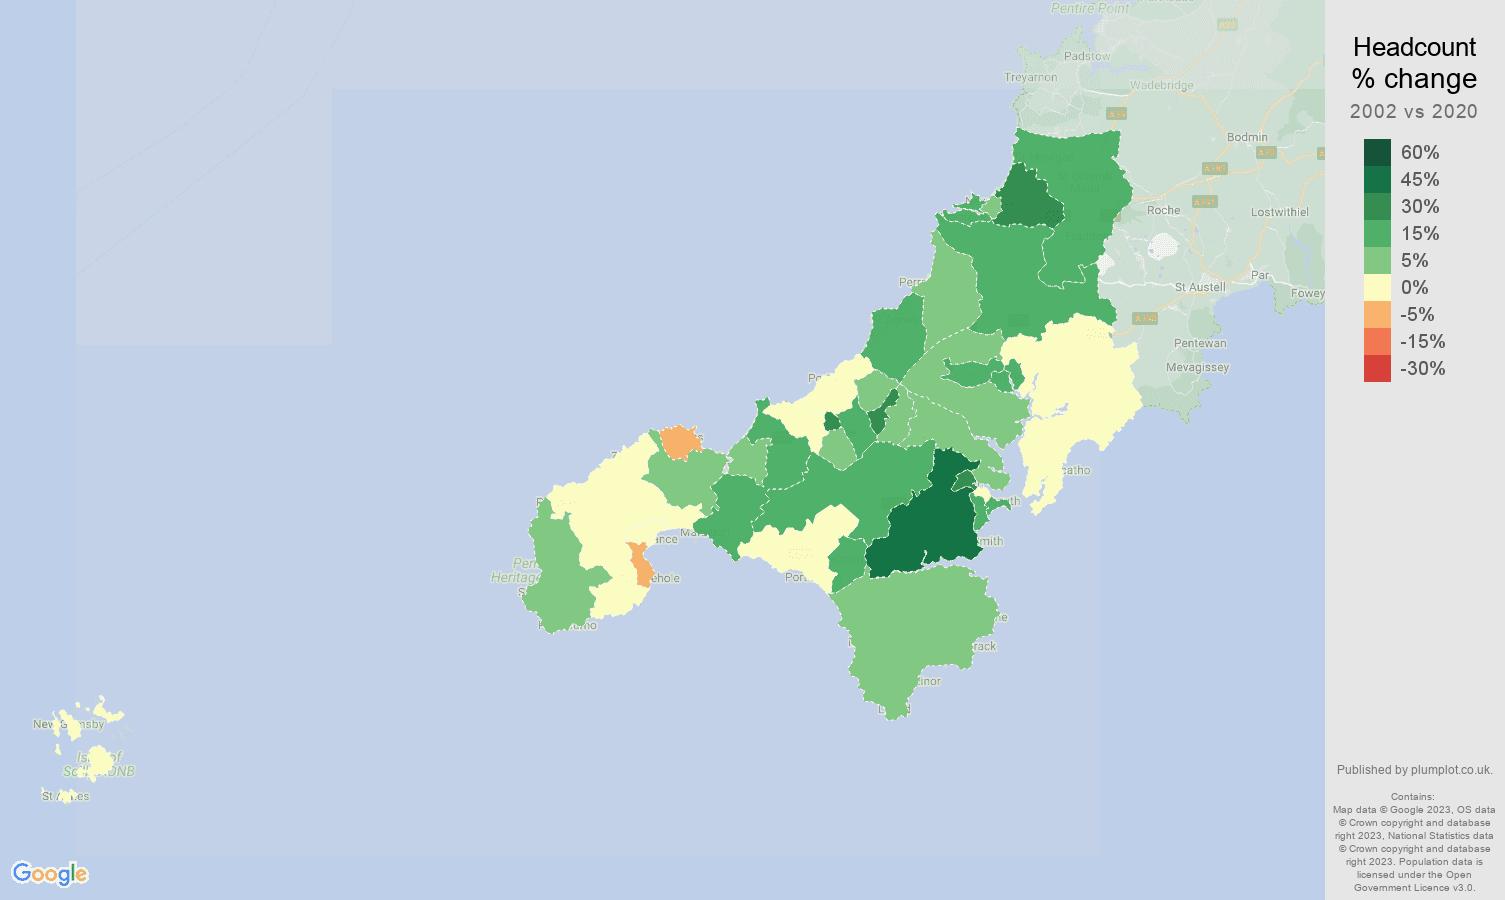 Truro headcount change map